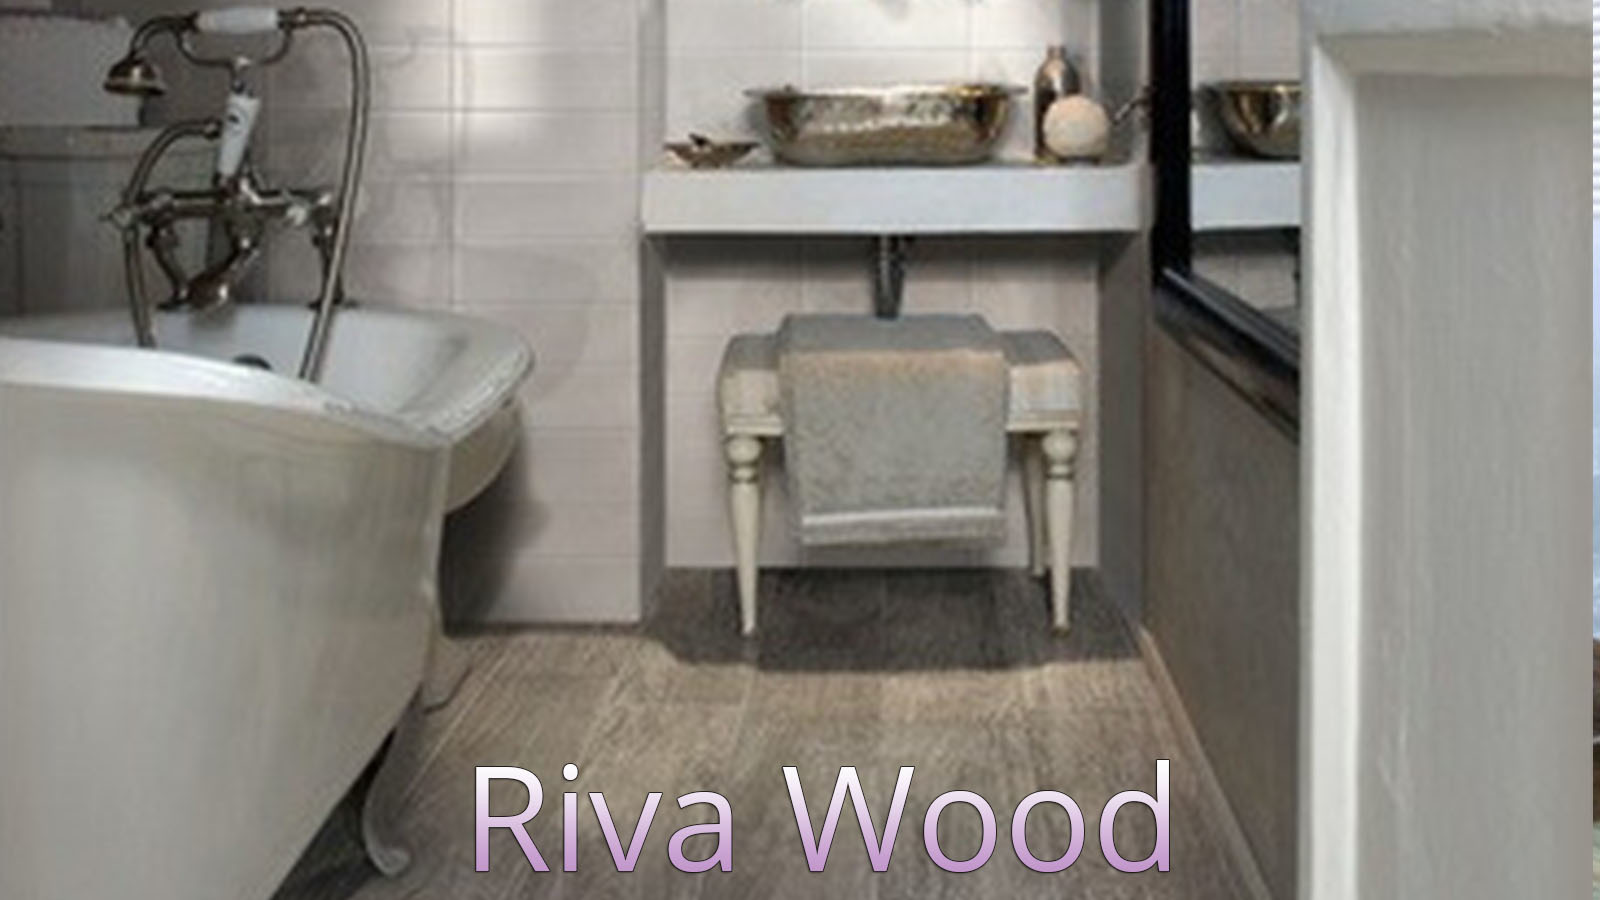 Riva wood 1